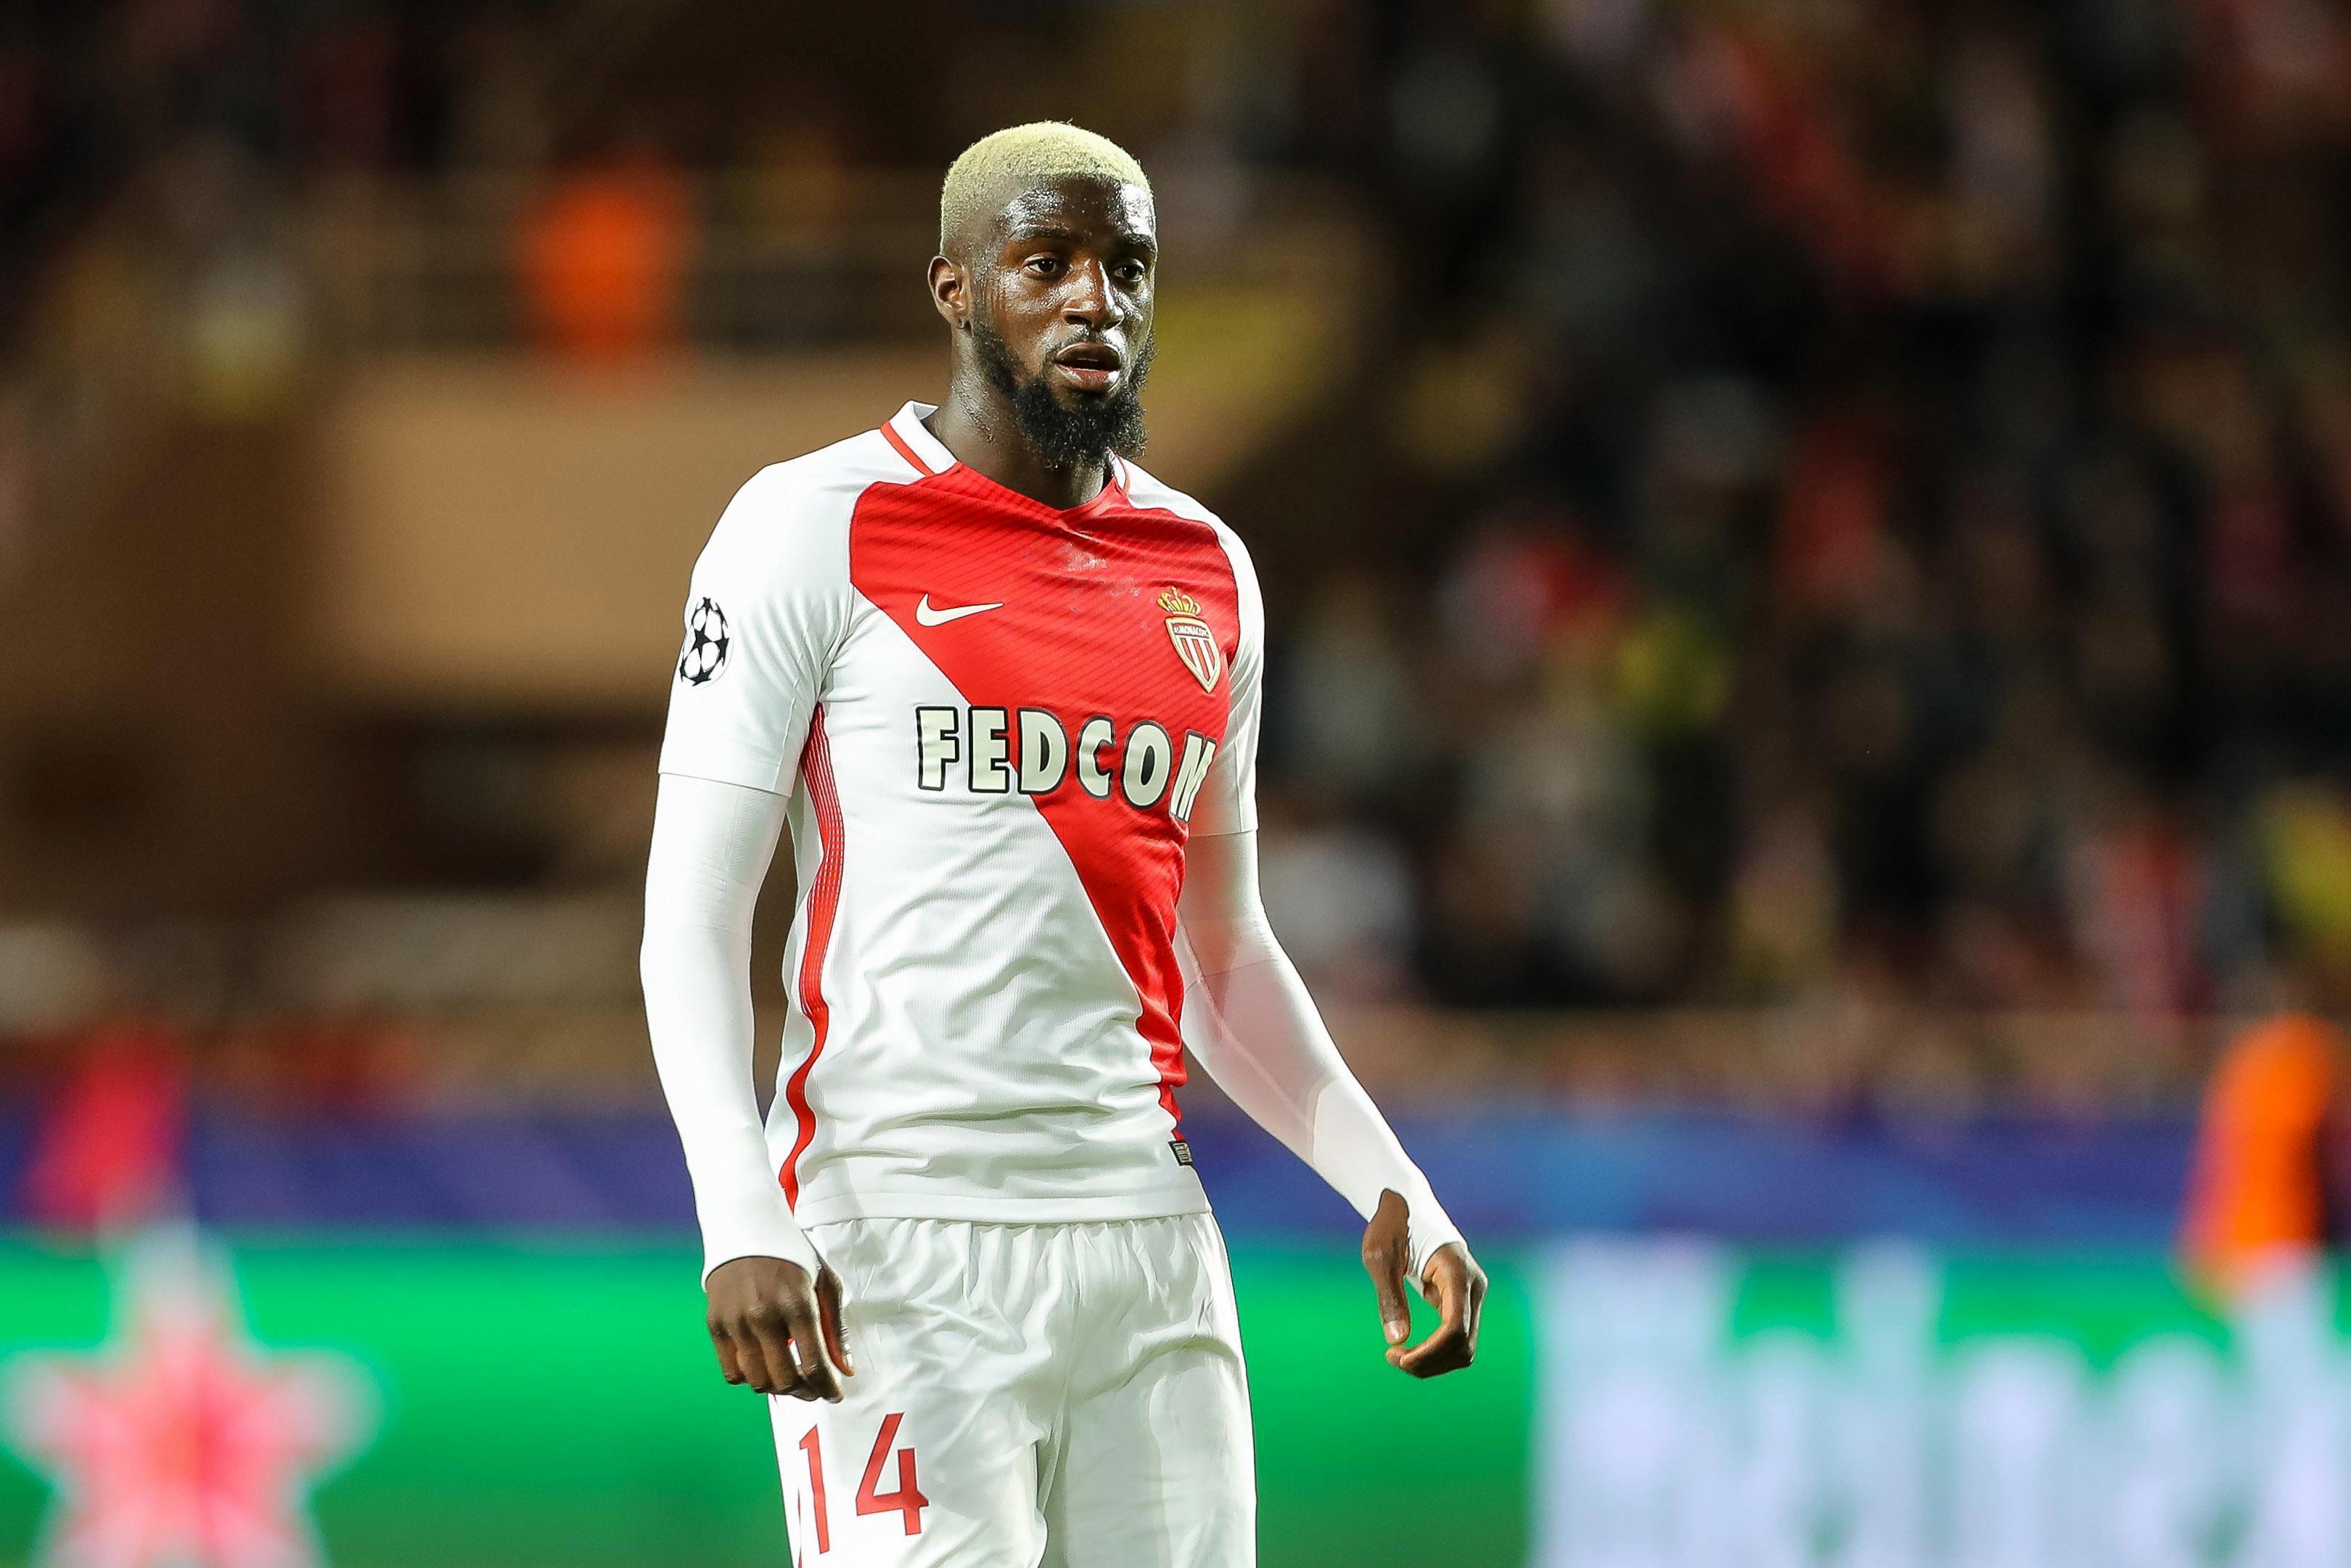 Tiemoue Bakayoko is set to arrive at Stamford Bridge from Monaco